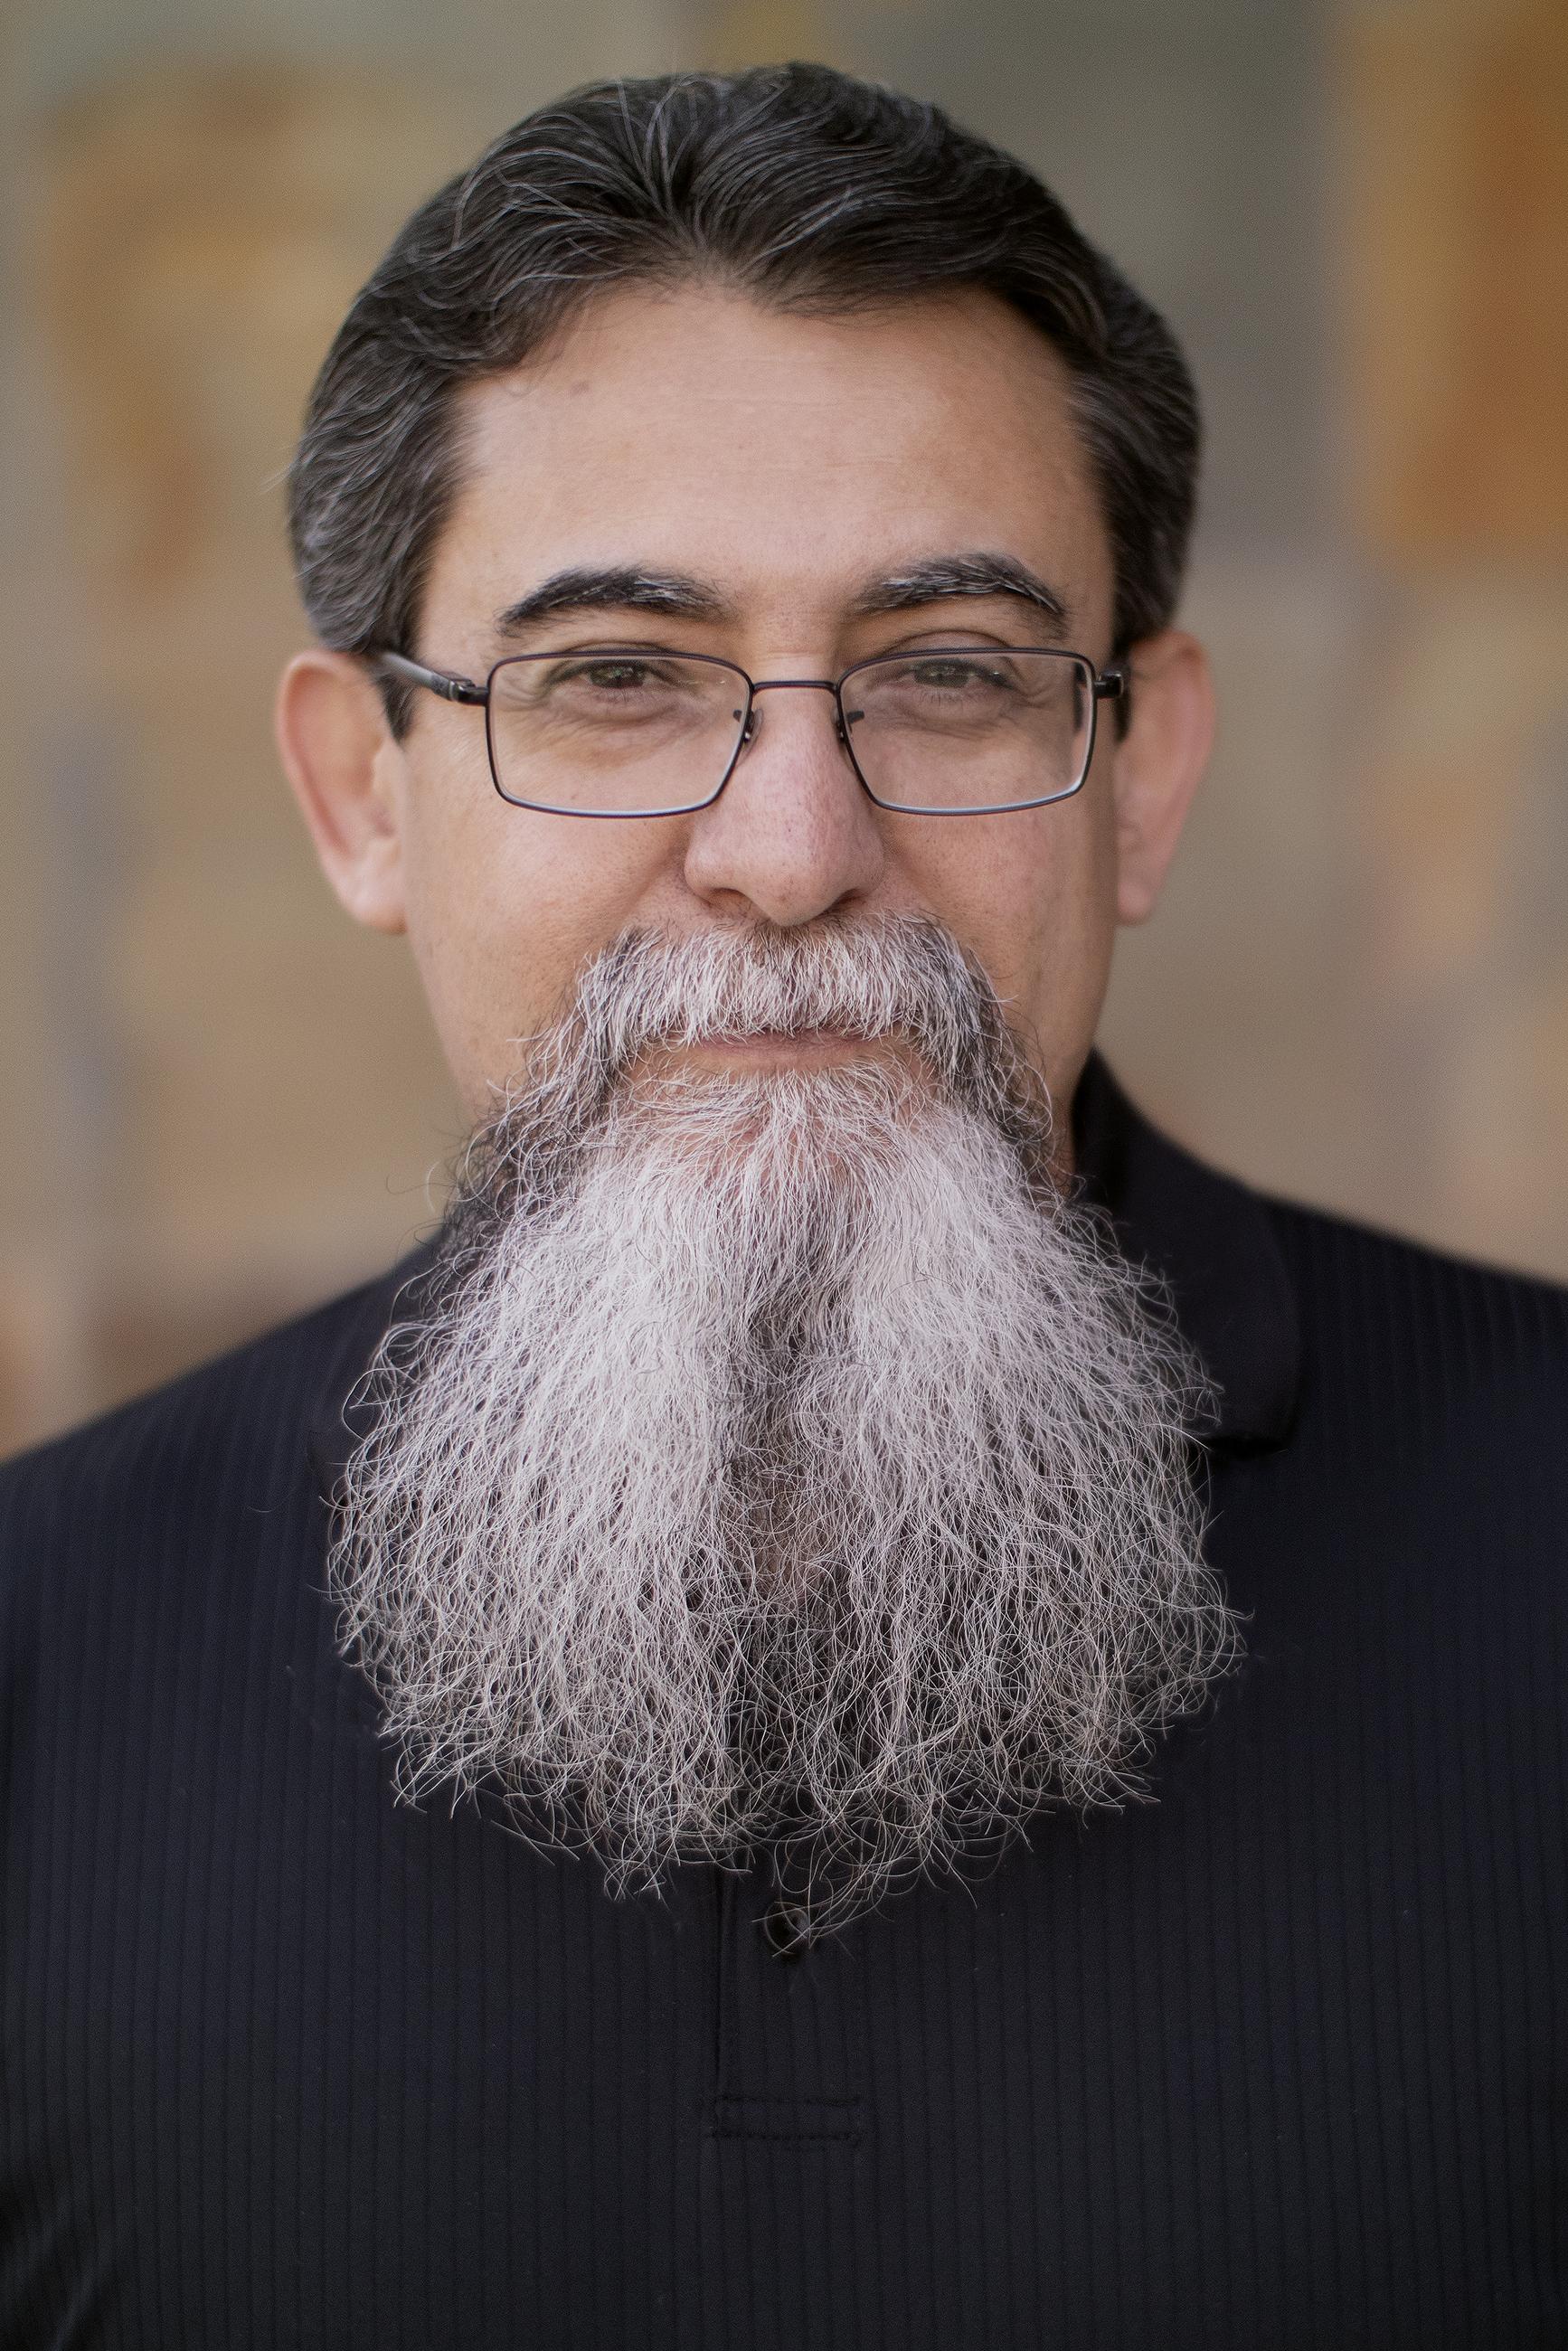 Richard Fregoso